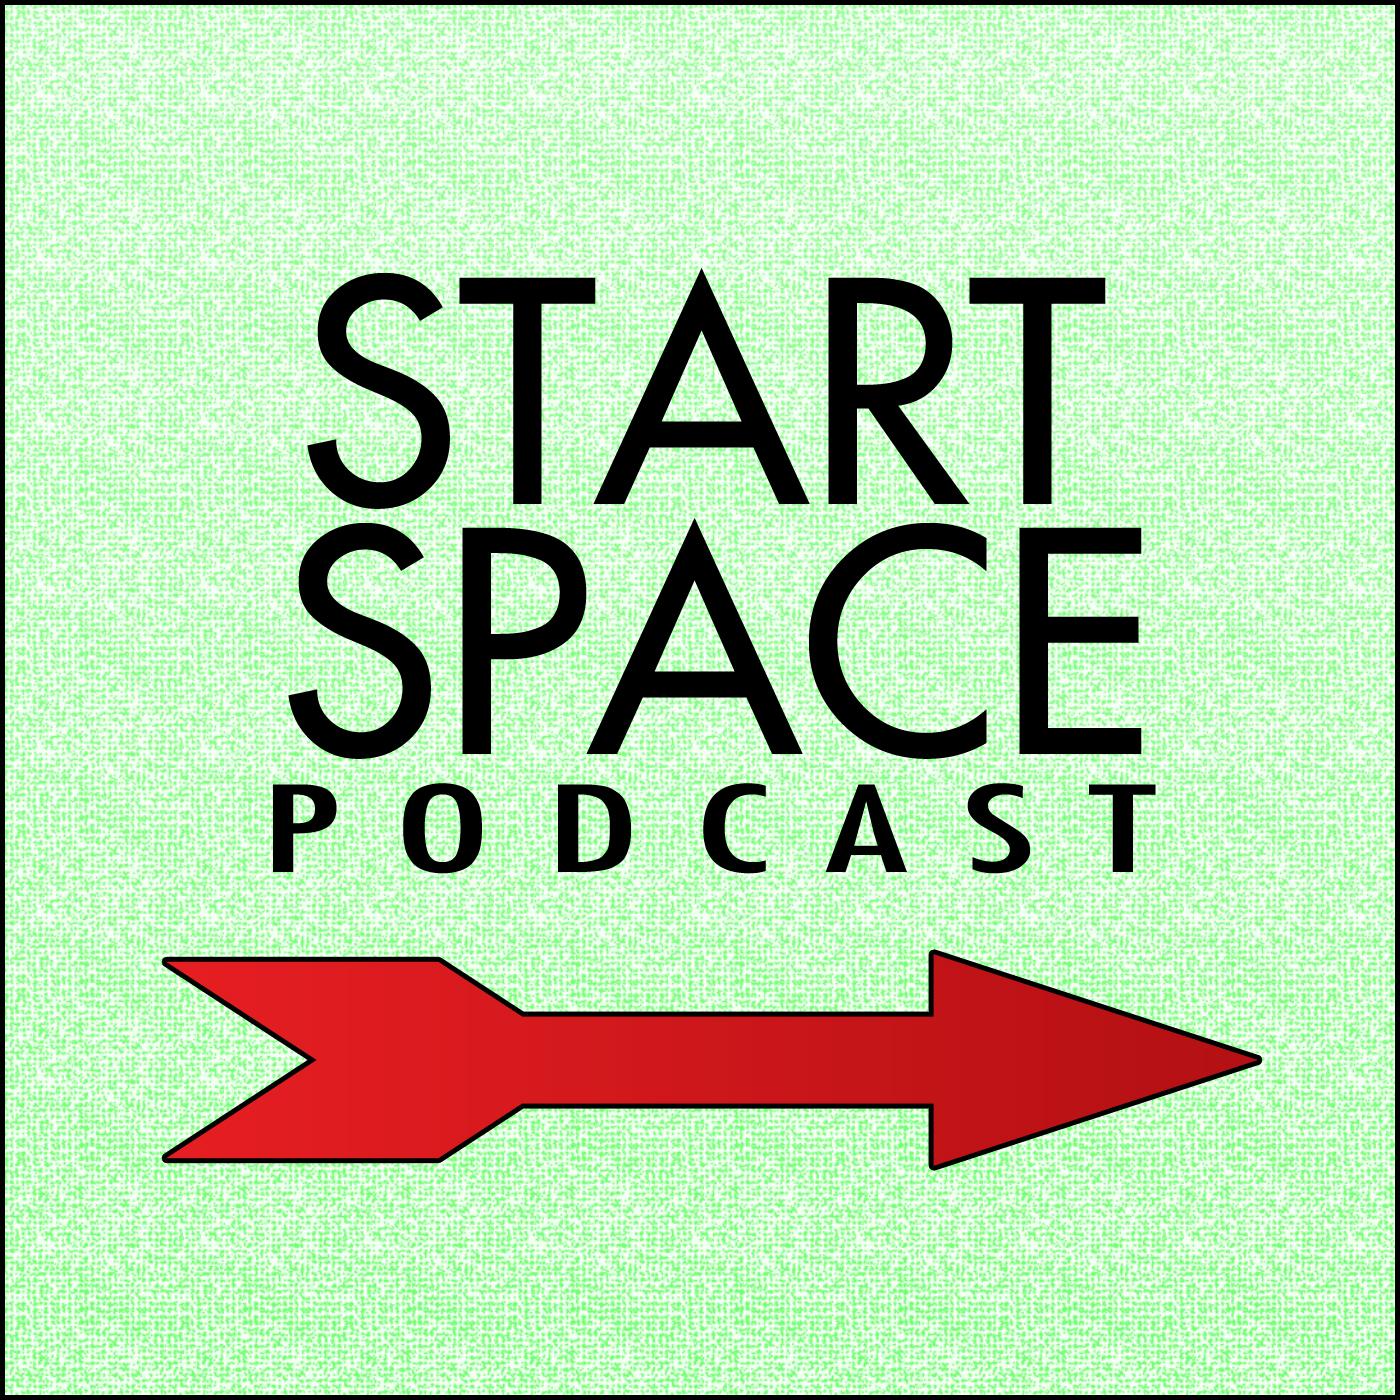 Start Space Podcast logo